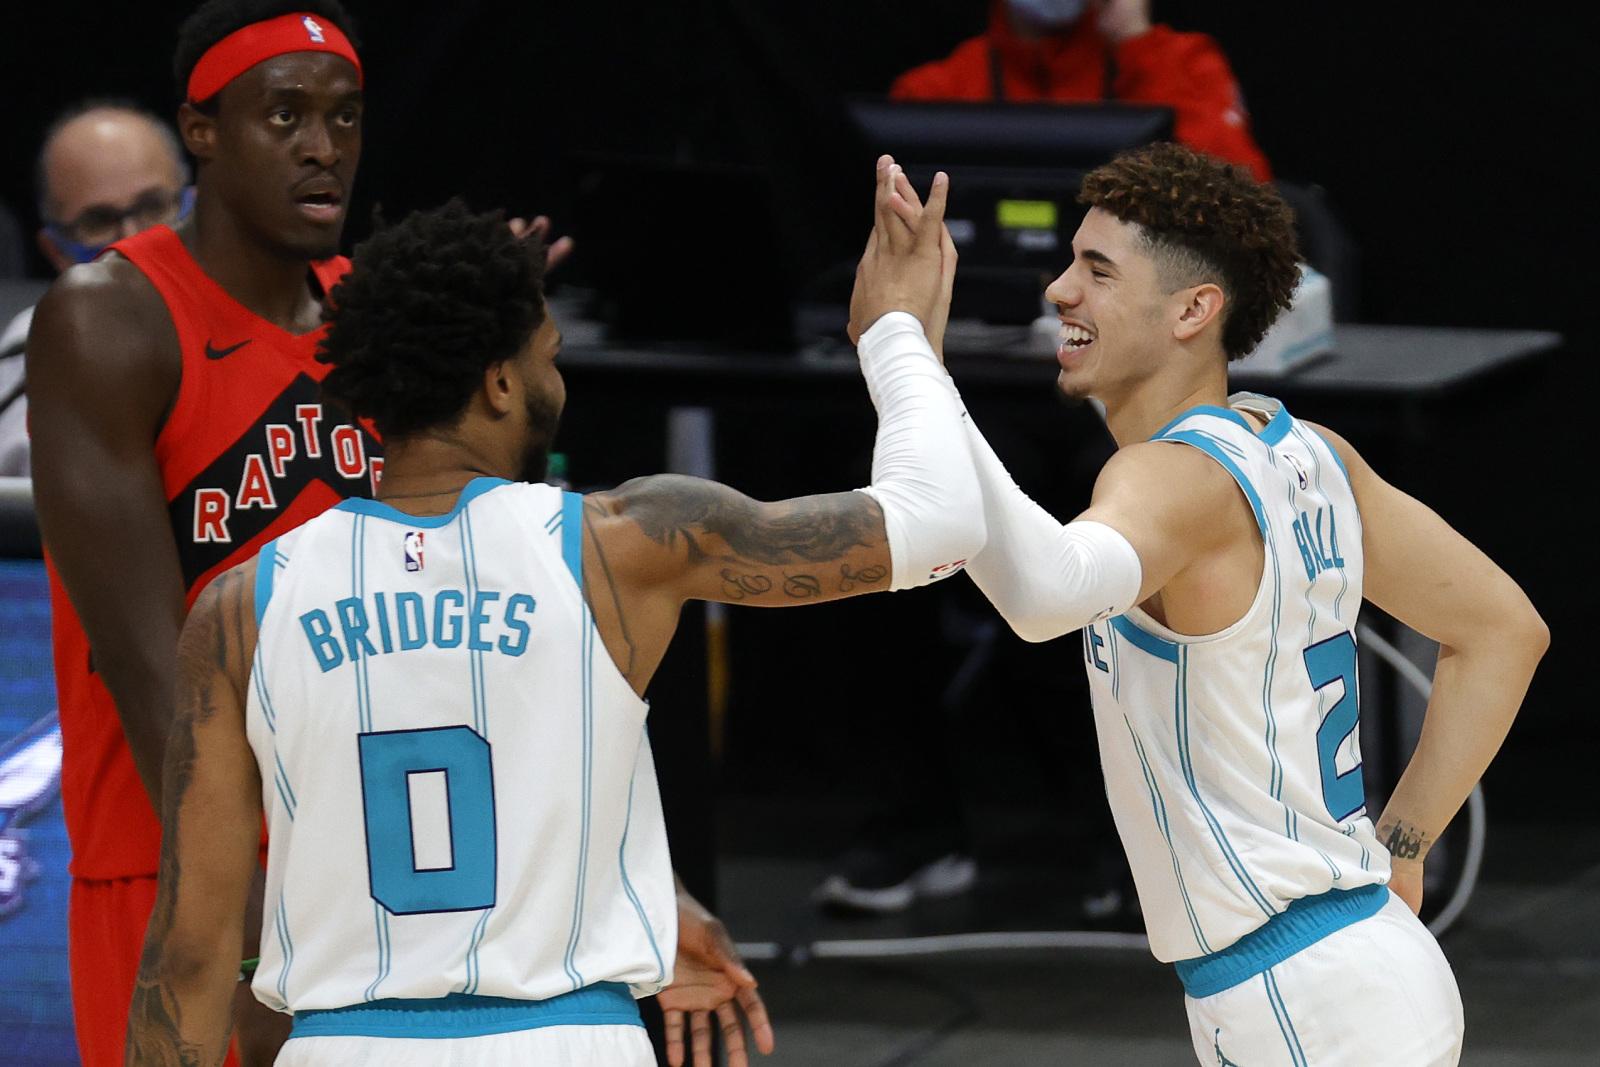 Key Takeaways From The Charlotte Hornets Loss Vs Raptors